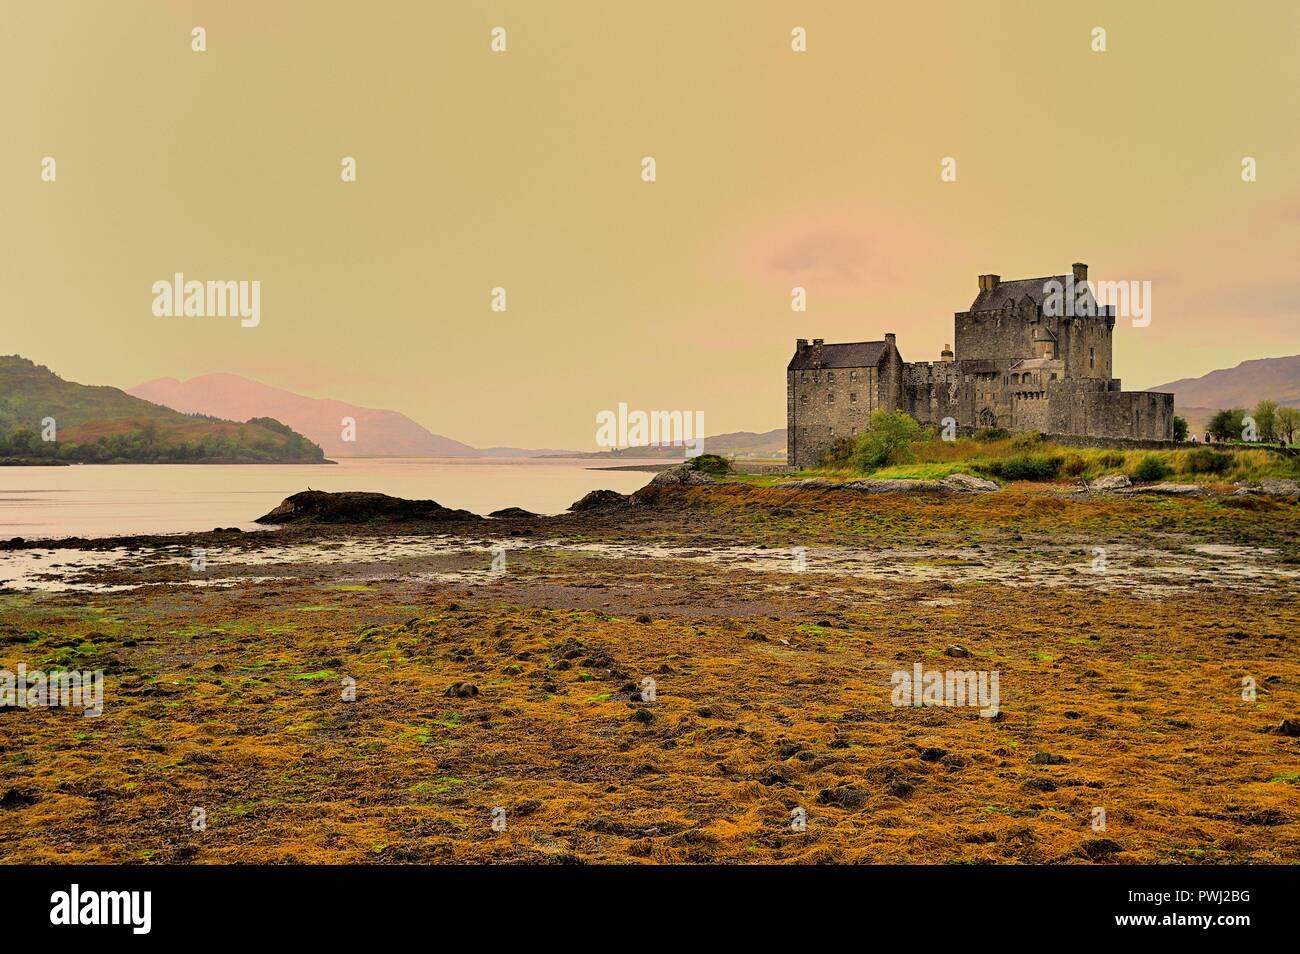 Dornie, by Kyle of Lochalsh, Northwest Highlands, Scotland, United Kingdom. Eilean Donan Castle, the most famous of Highland castles. - Stock Image